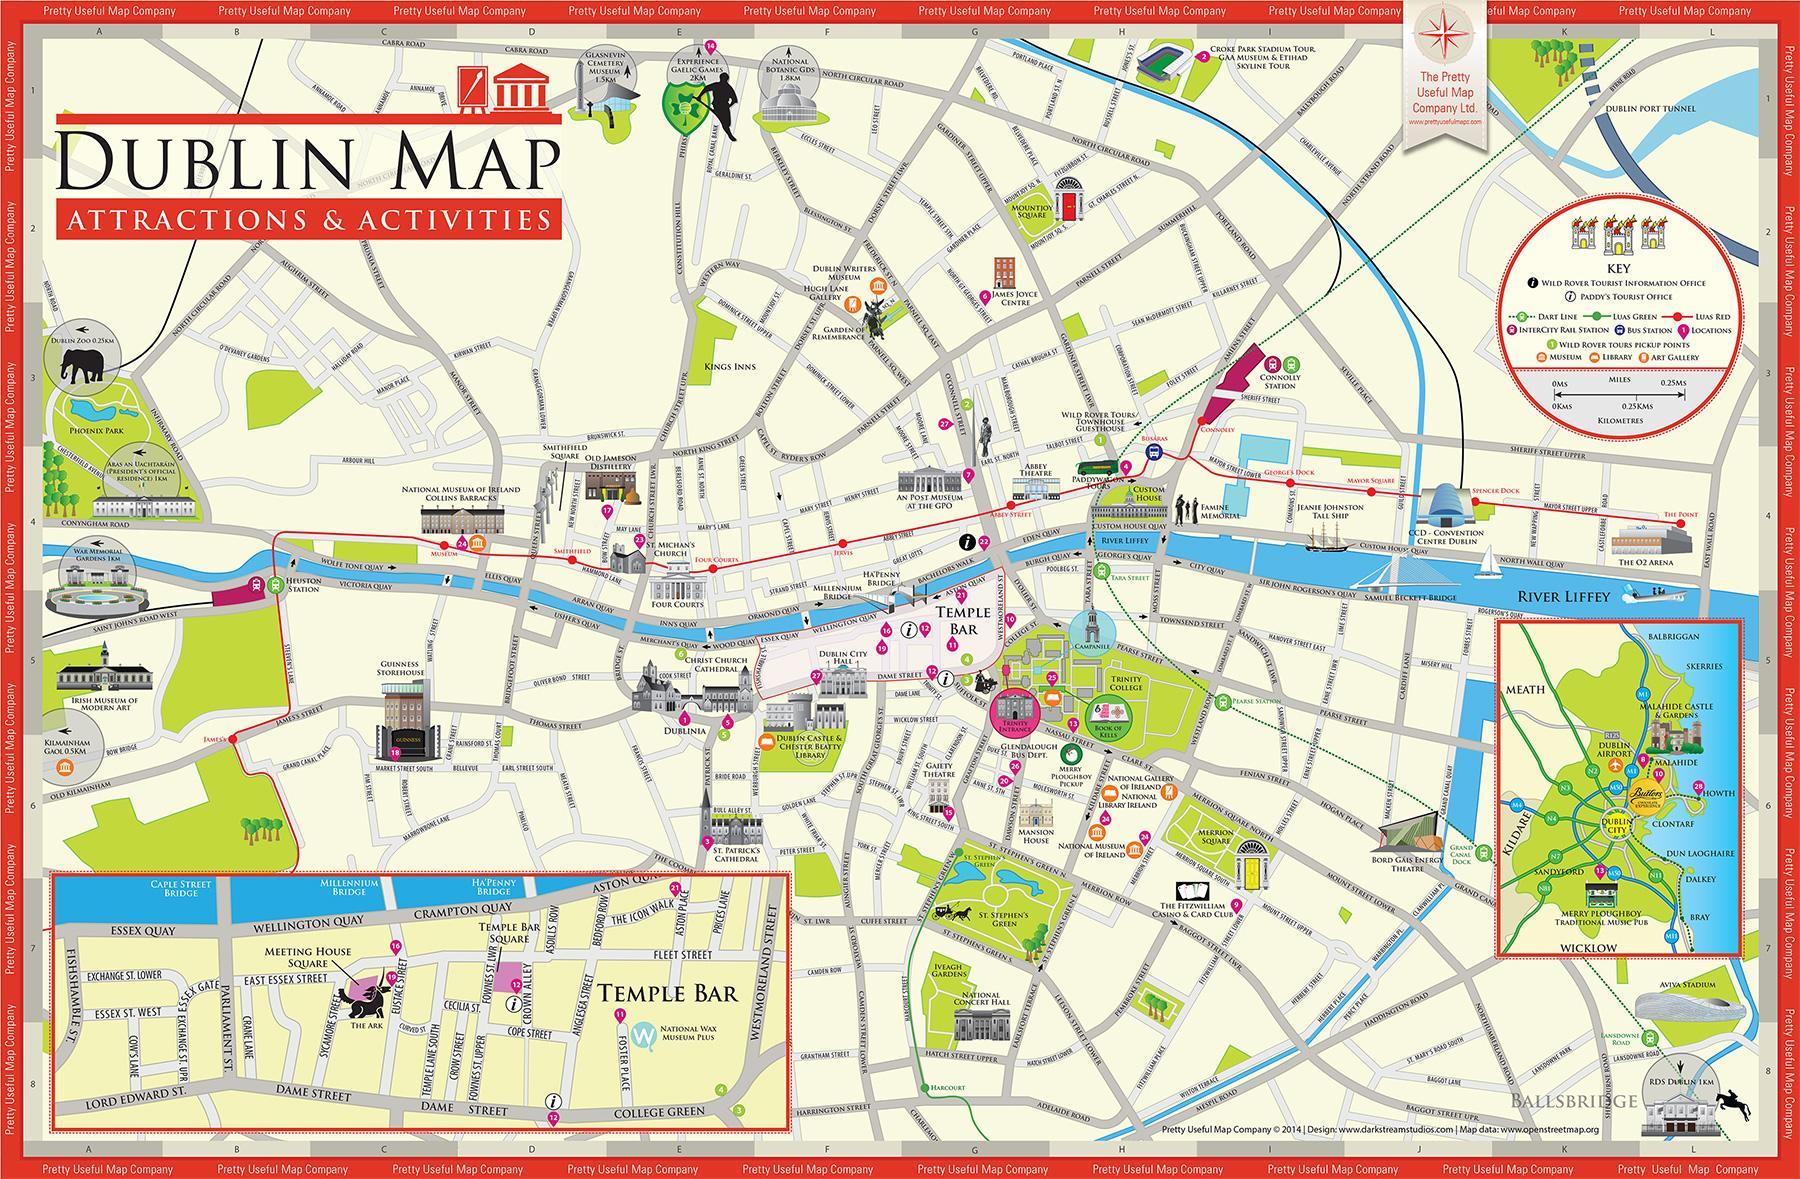 Tourist Map Dublin - Map Of Dublin Tourist Attractions (Ireland) - Dublin Tourist Map Printable